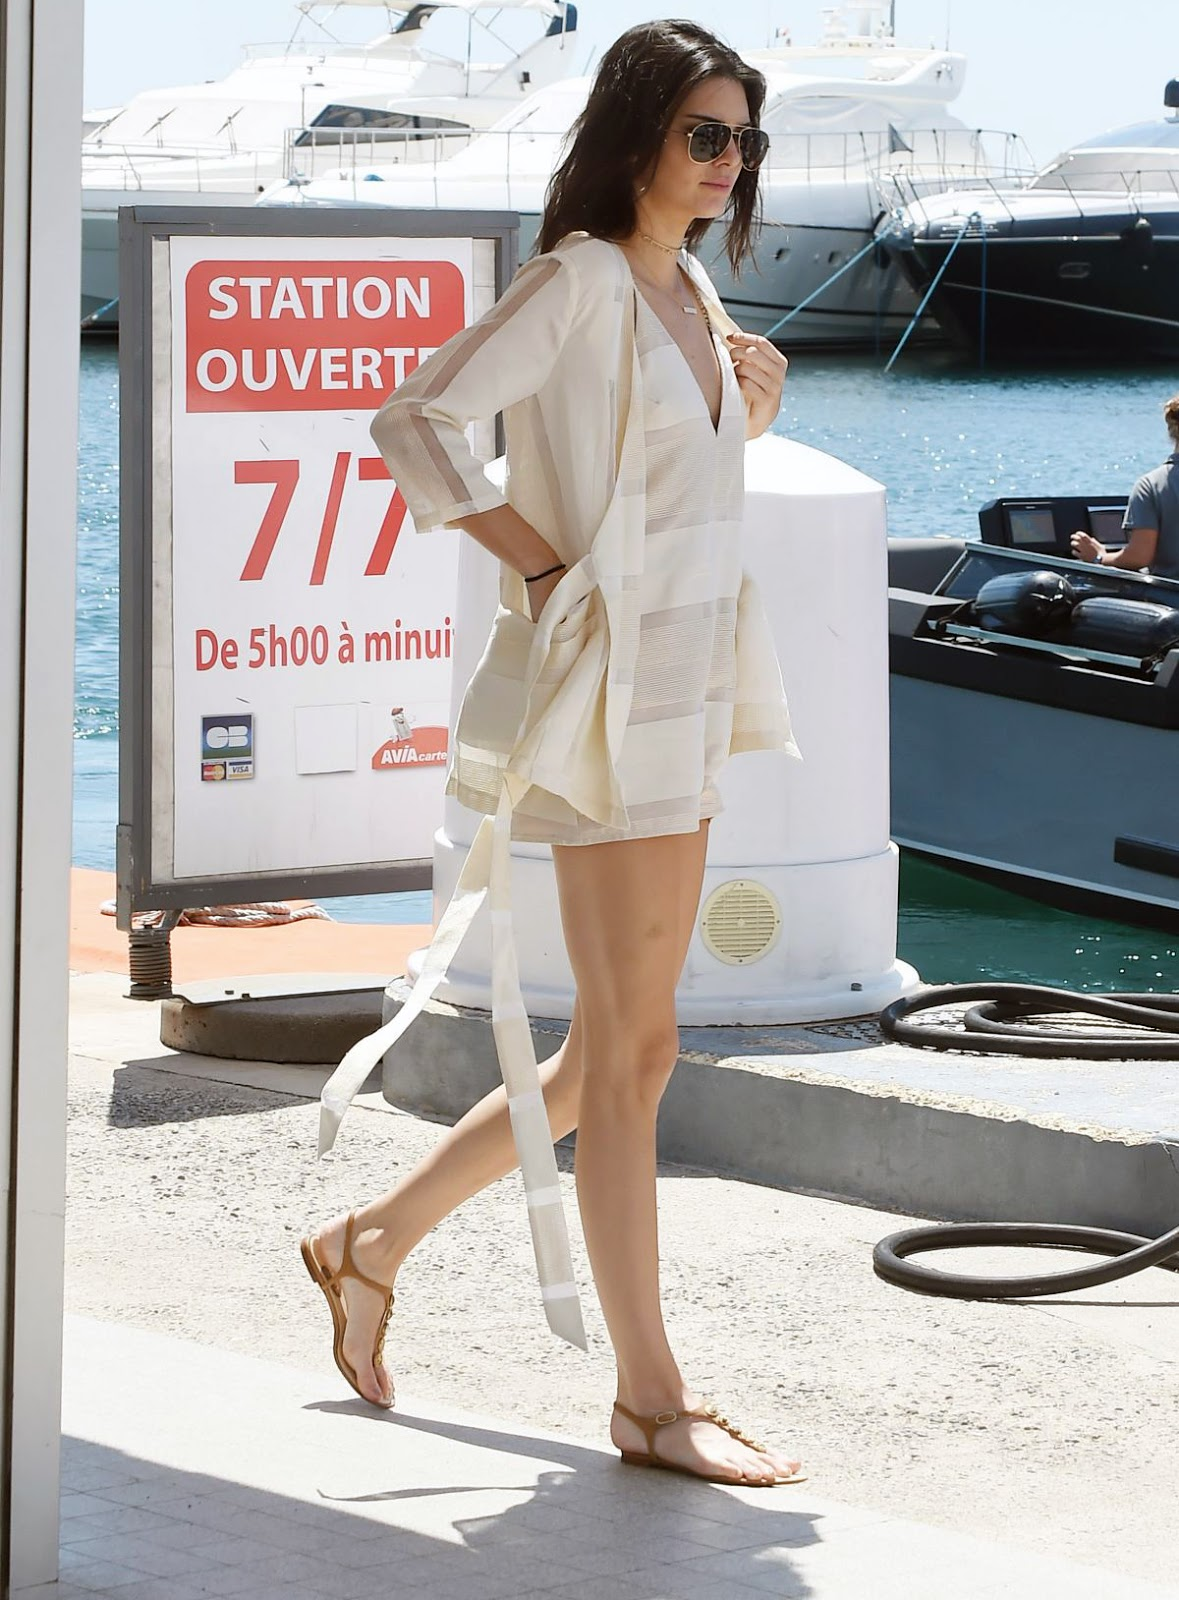 kendall jenner mặc đồ jumpsuit ngắn mùa hè mang giày sandal dây